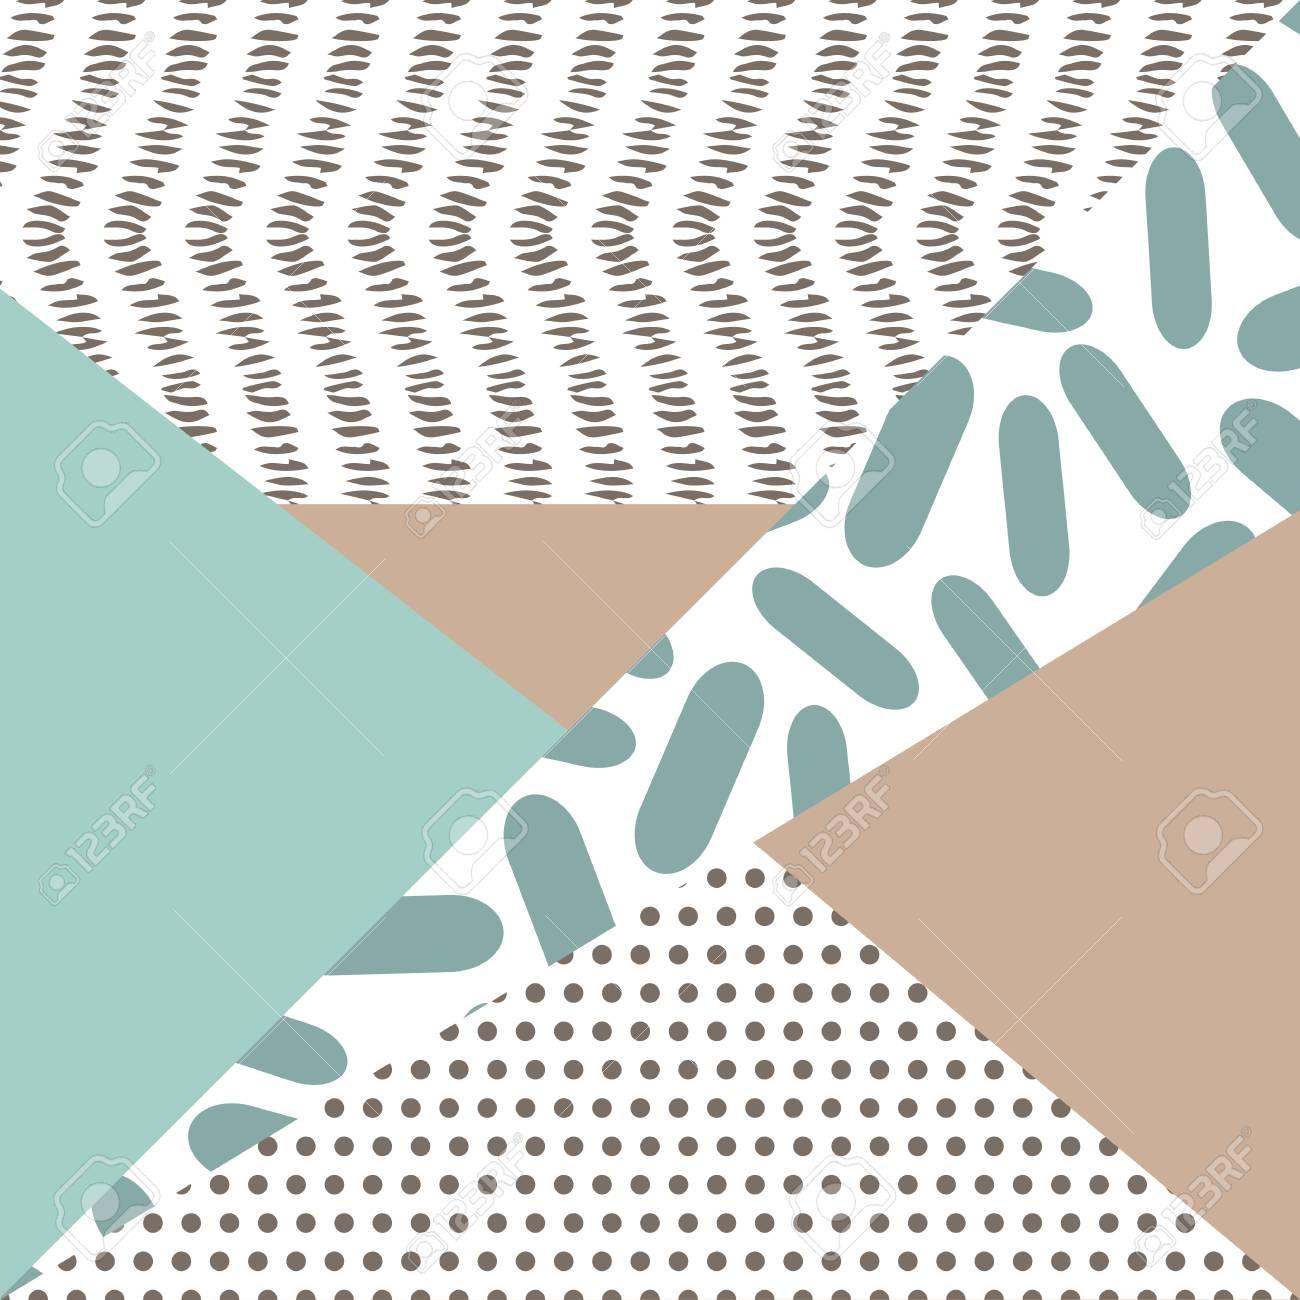 geometric card vector illustration banner postcard art design royalty free cliparts vectors and stock illustration image 88845801 geometric card vector illustration banner postcard art design